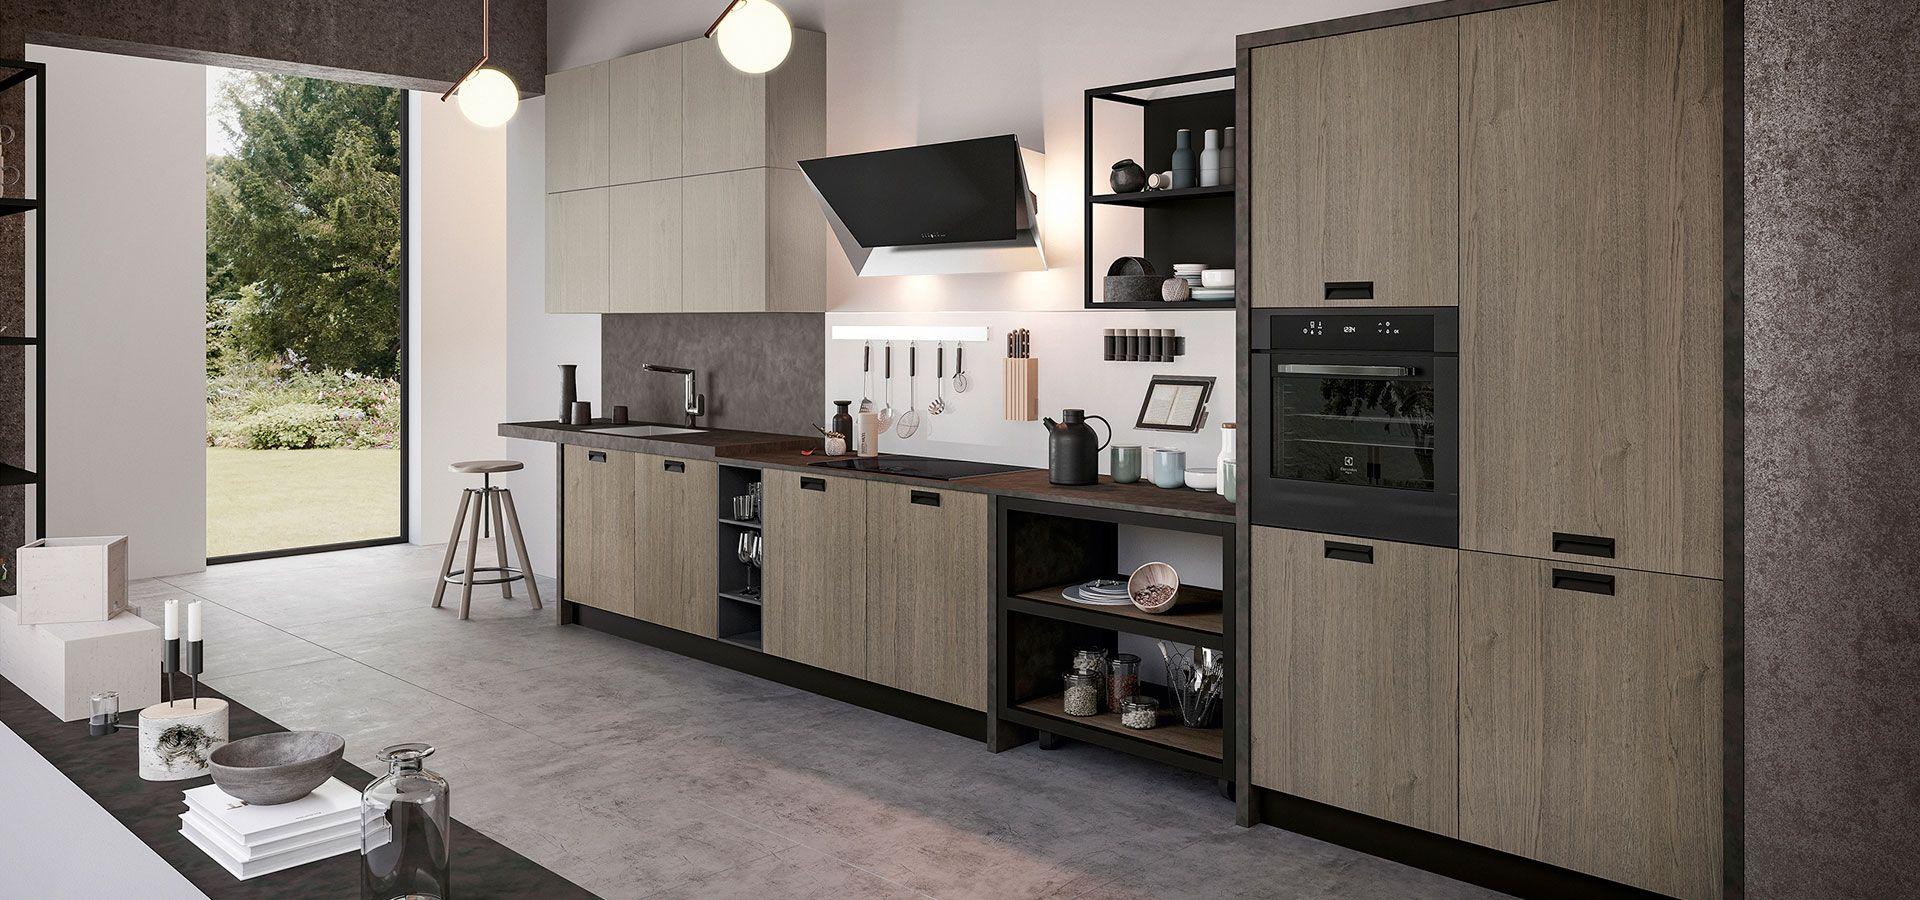 Cuisine moderne ASIA - Arredo3   cucina   Pinterest   Asia, Kitchens ...